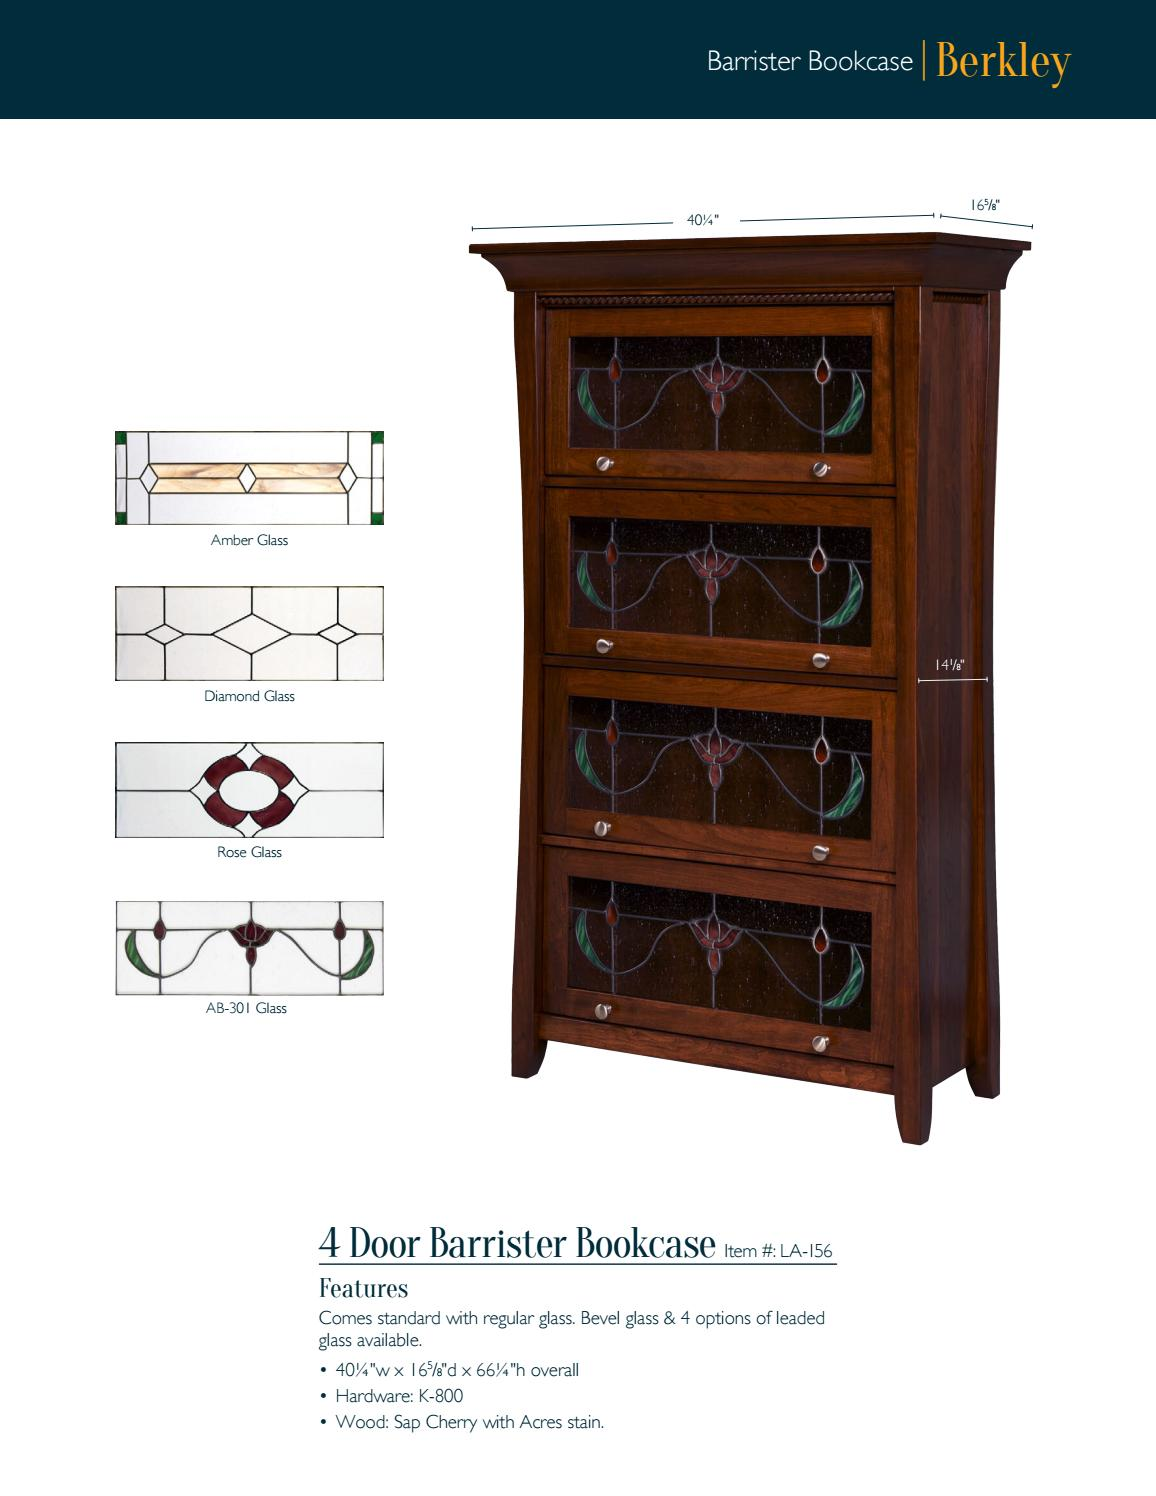 2016 Lamb Woodworking Bookcase Catalog Bookcases E G